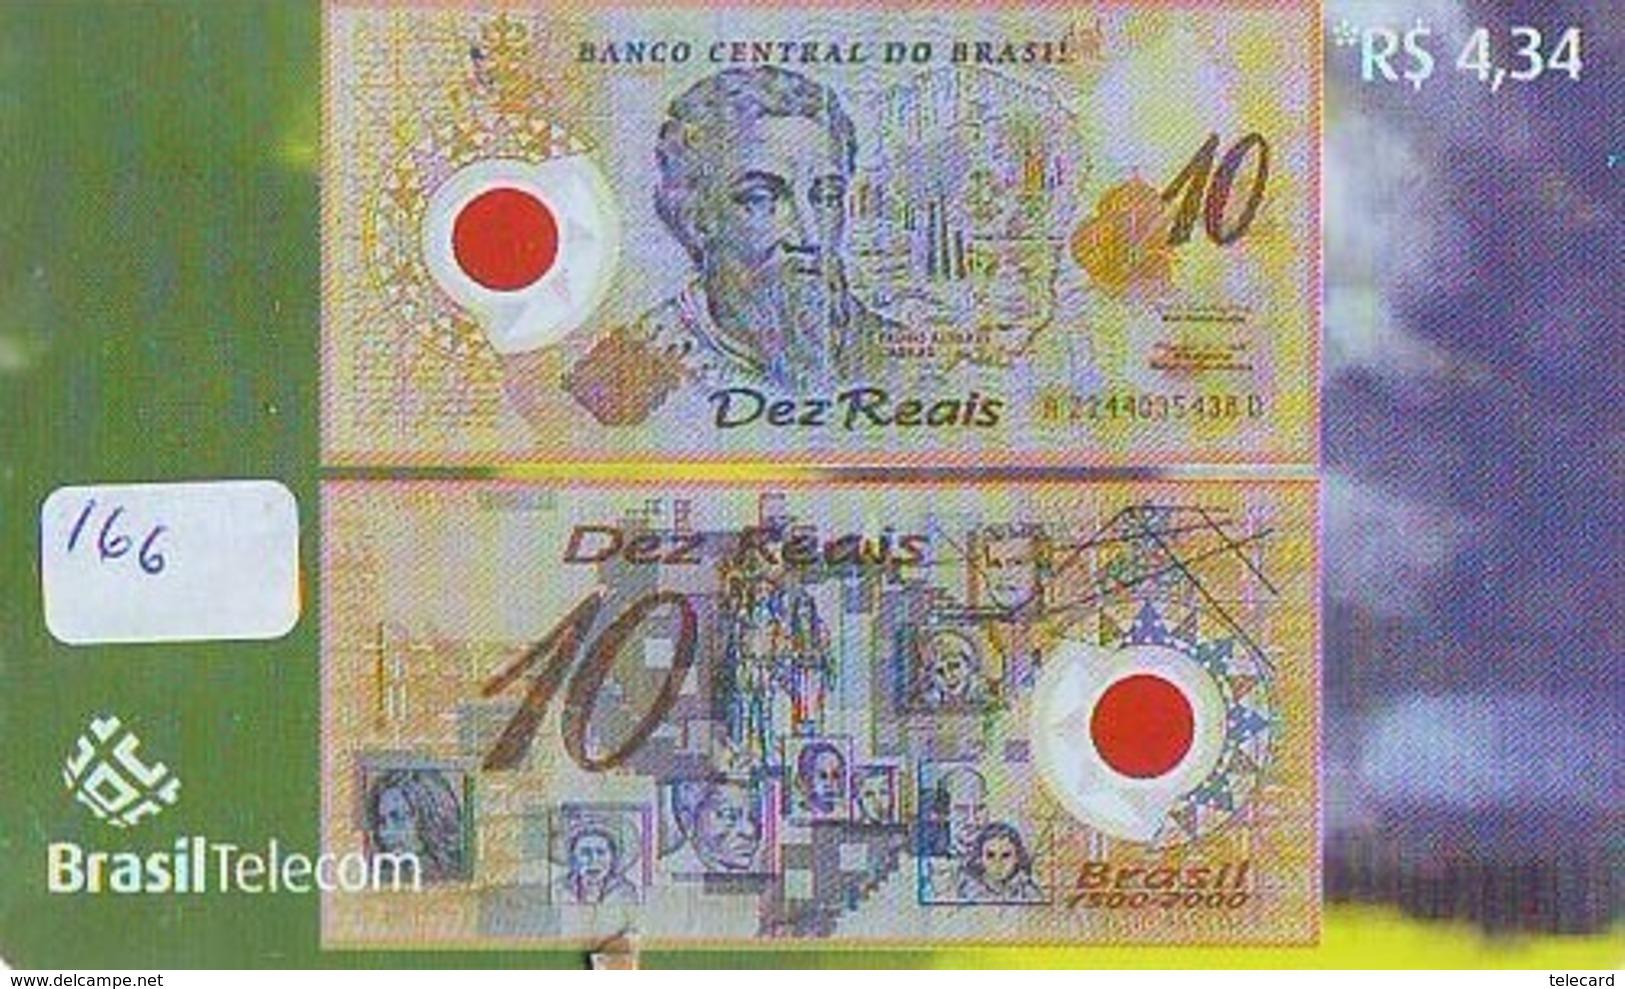 BRASIL * TELECARTE * BILLET De Banque * (166) Banknote * Japan Phonecard  GELDSCHEIN * Coin * BANKBILJET - Timbres & Monnaies